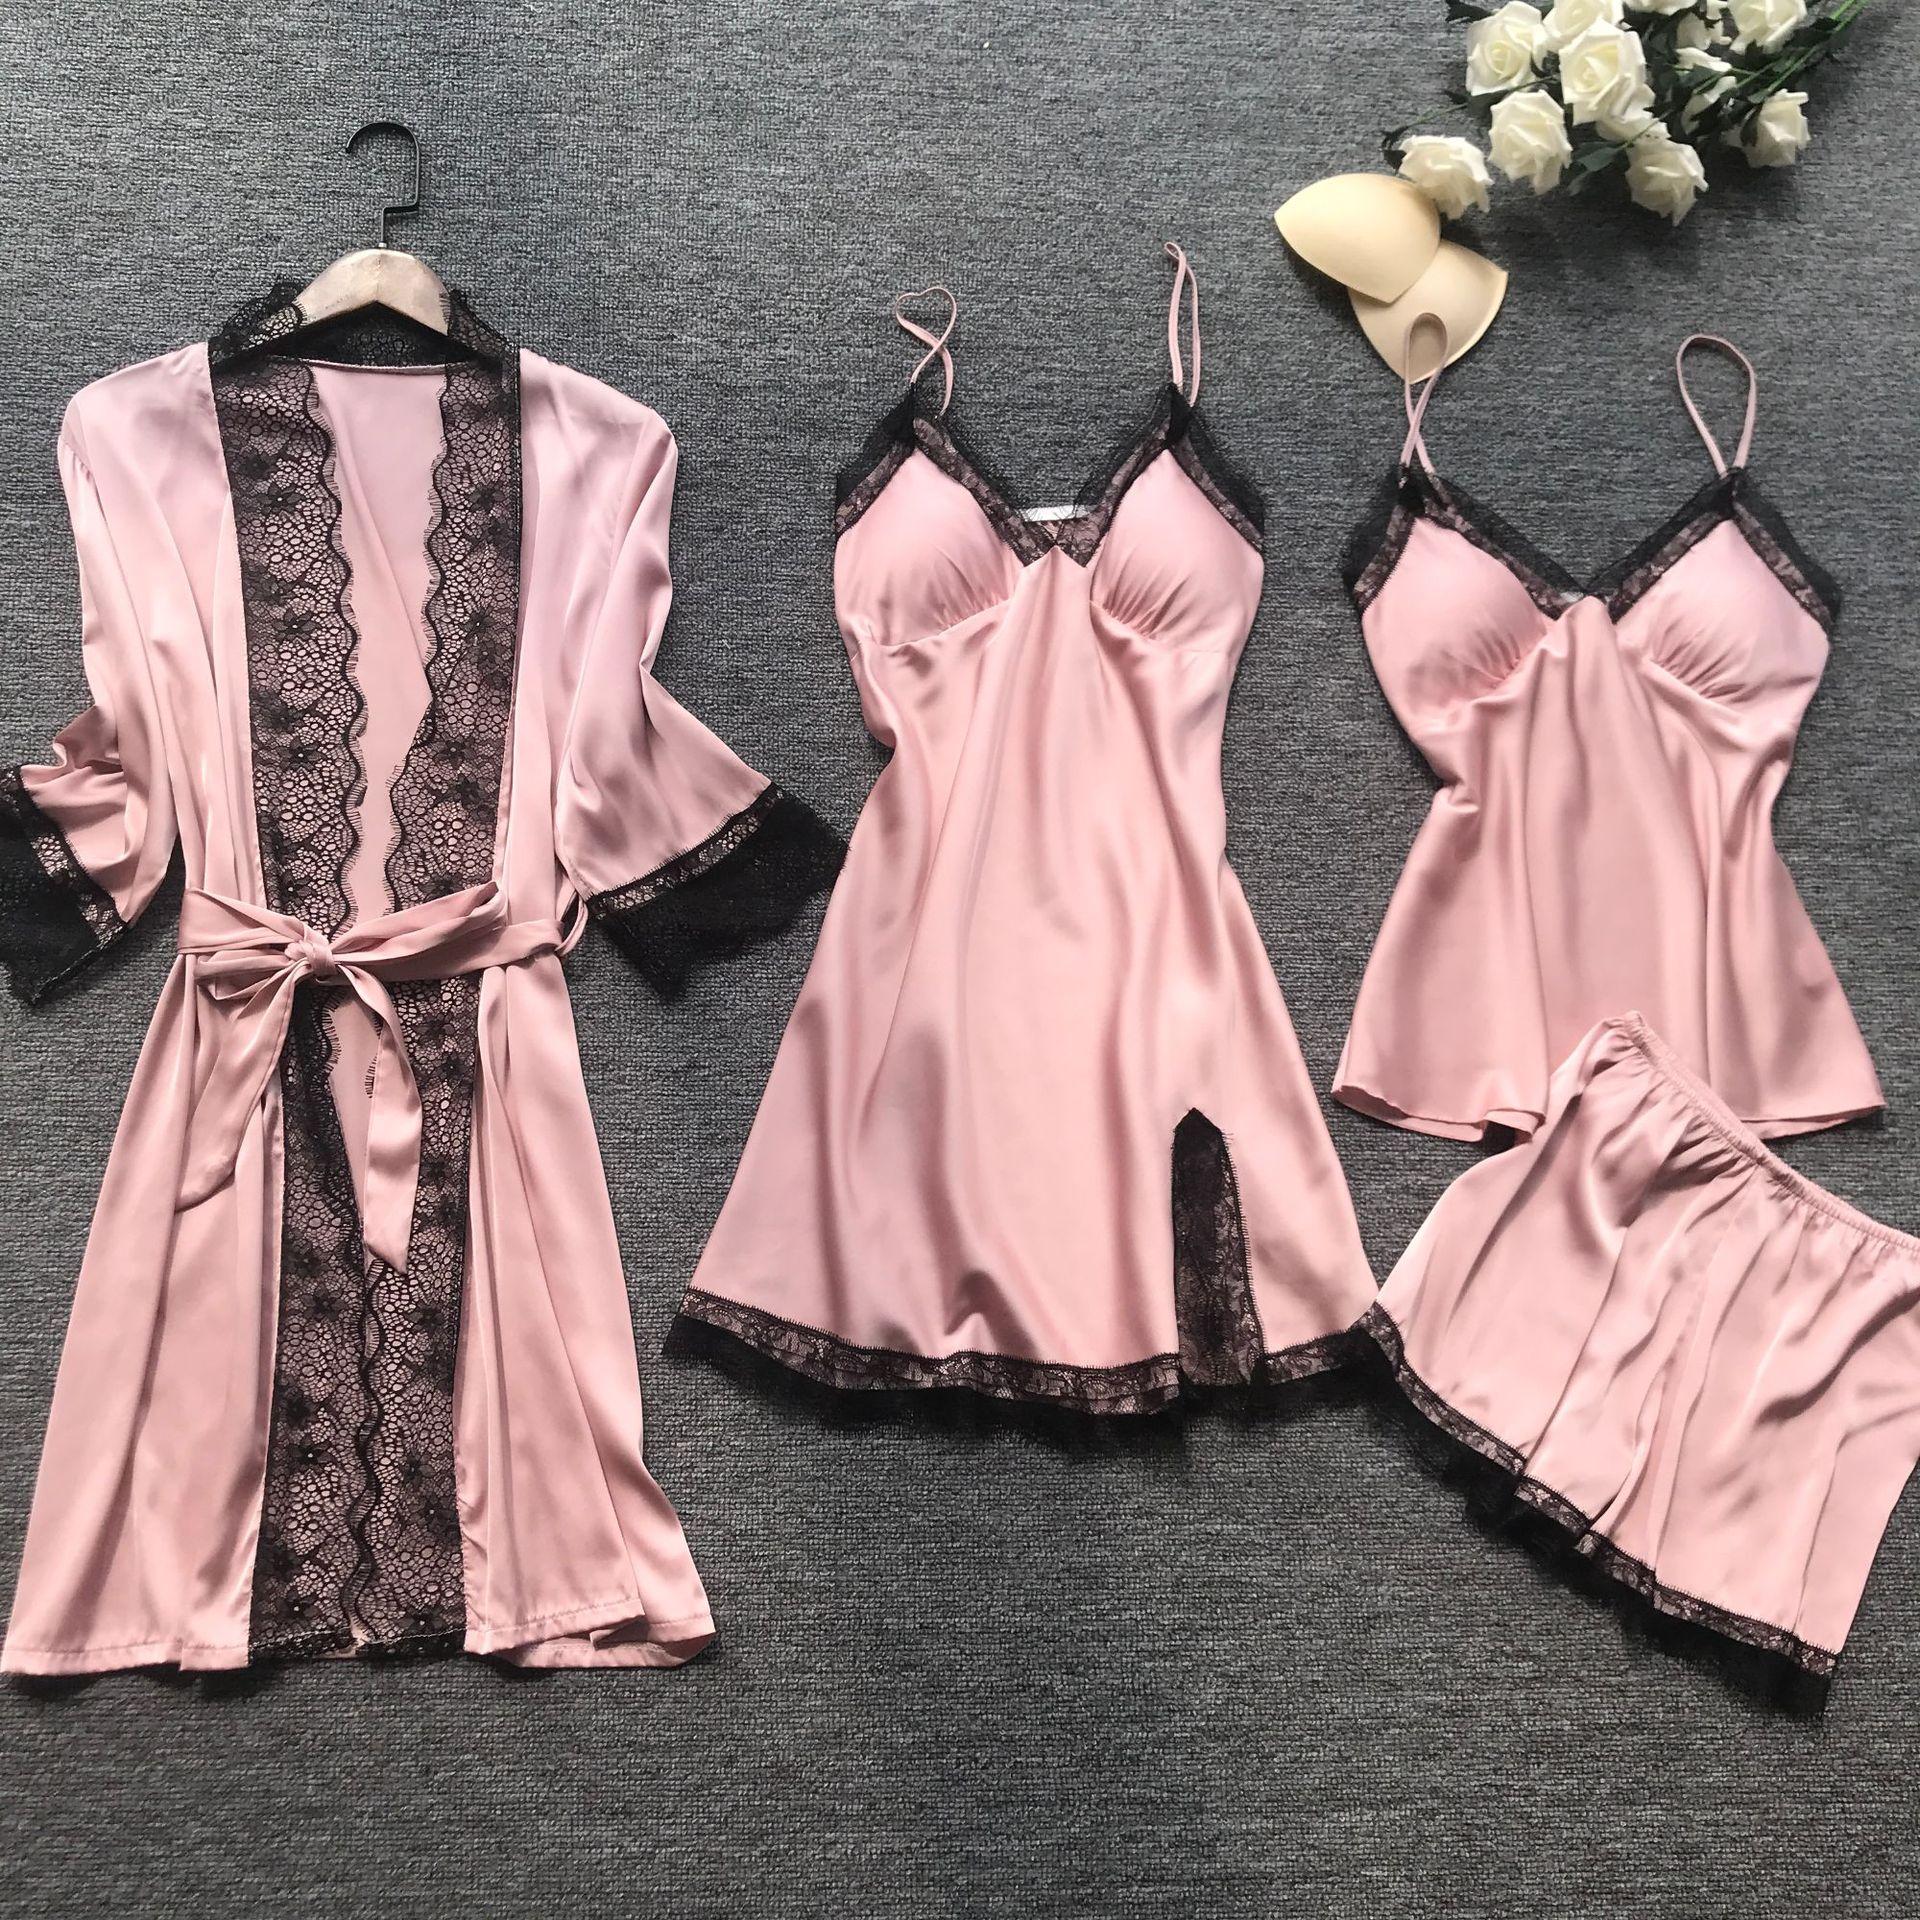 QWEEK Summer 2019 Women   Pajama     Sets   4 Pcs Sexy Lace Pyjamas Women Satin Silk Sleepwear Elegant Pijama with Chest Pads Homewear